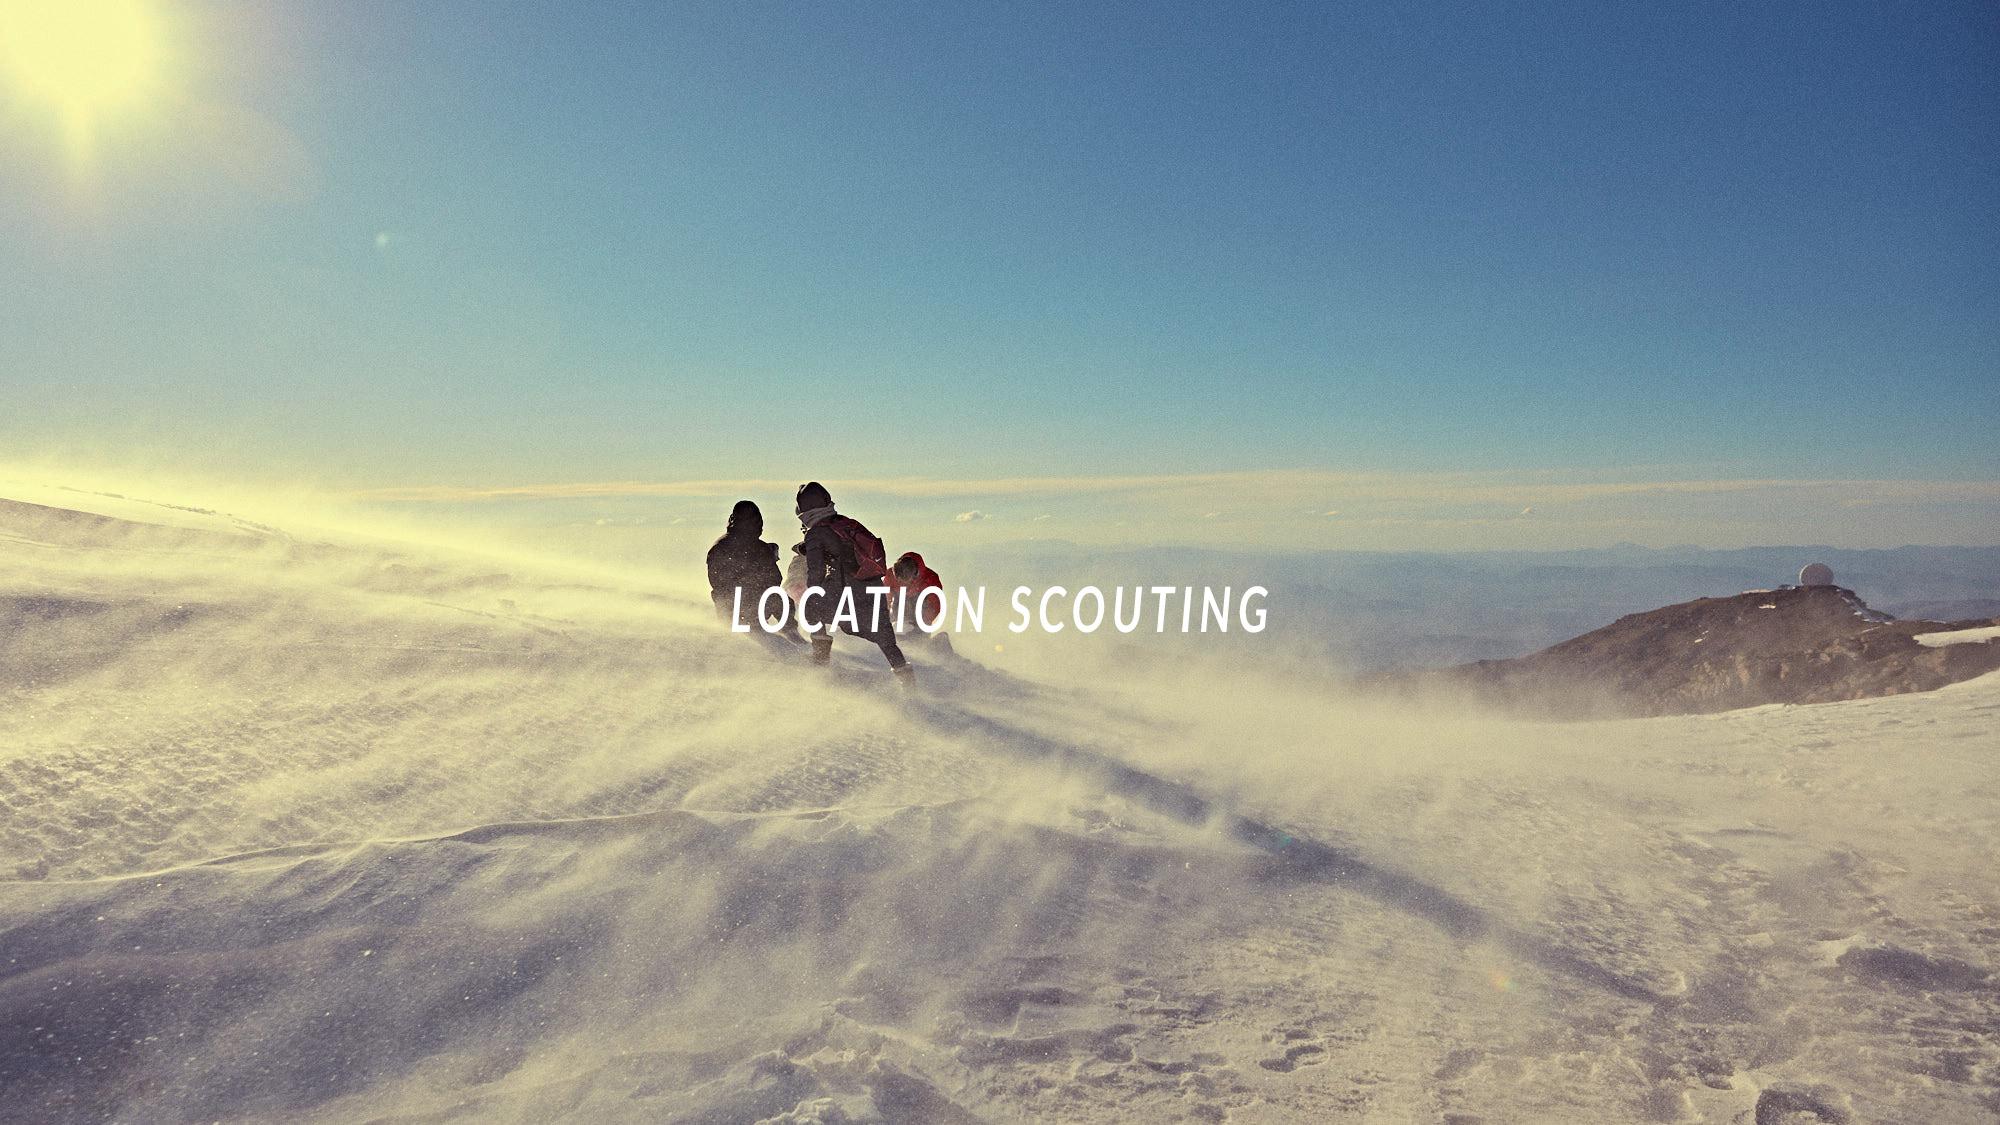 location scouintg